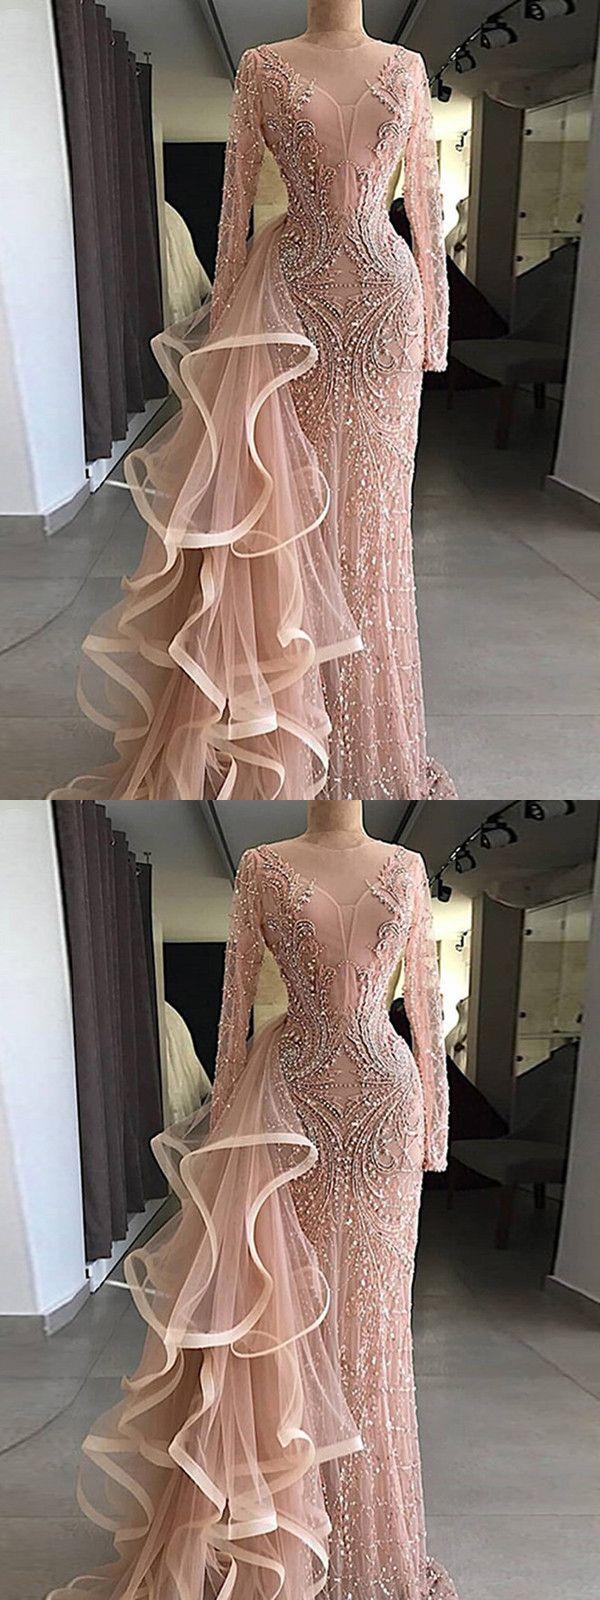 Michal negrin wedding dress   best ROSA images on Pinterest  Bridal dresses Short wedding